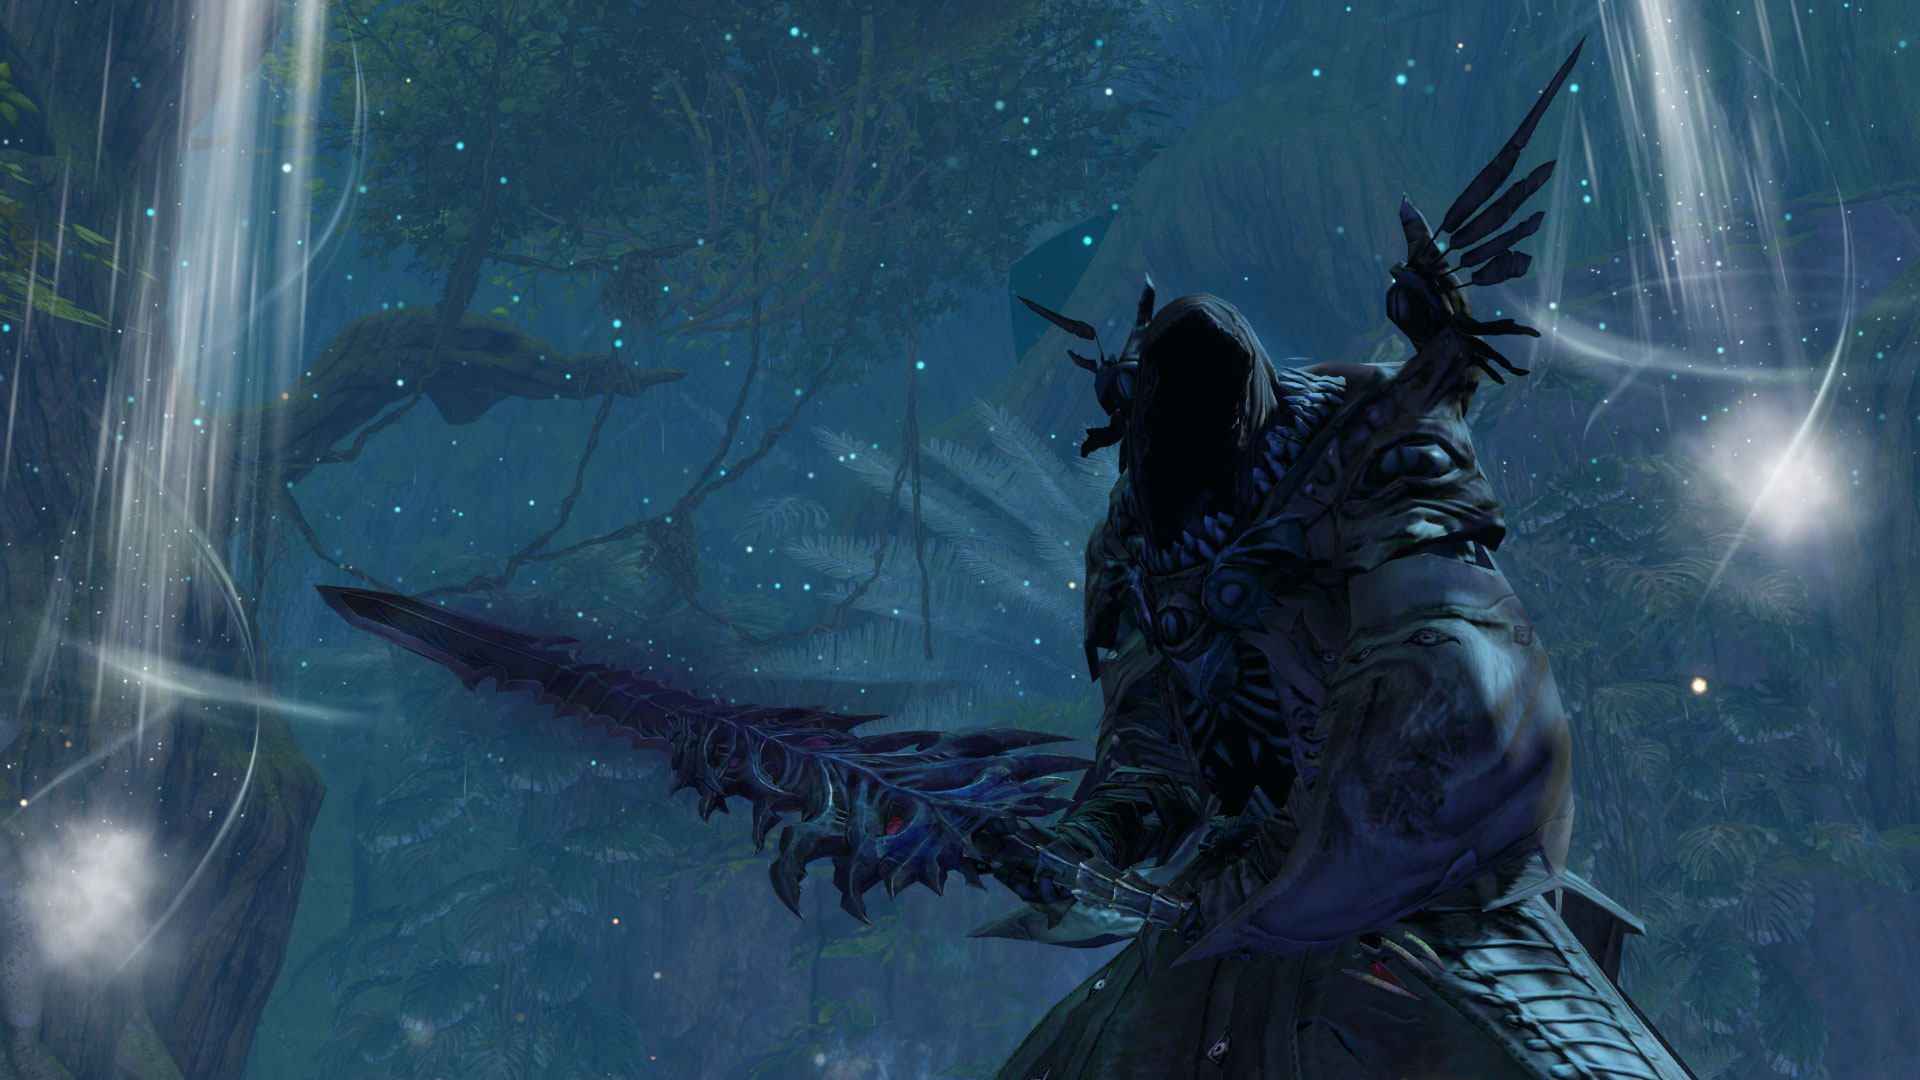 Meet the Reaper: Necromancer's Elite Specialization   GuildWars2 com